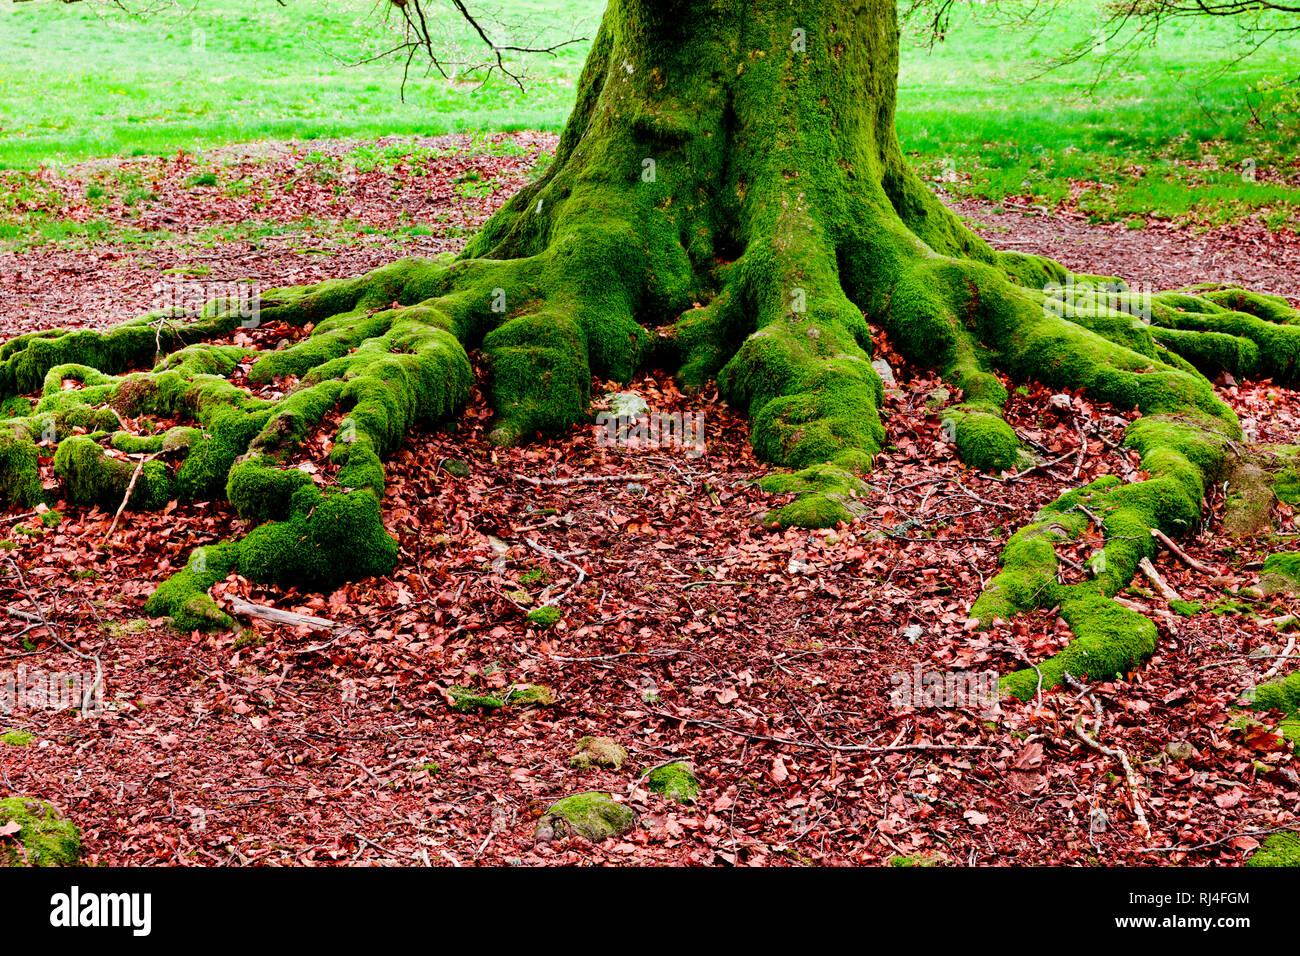 Bemooste Baumwurzeln - Stock Image